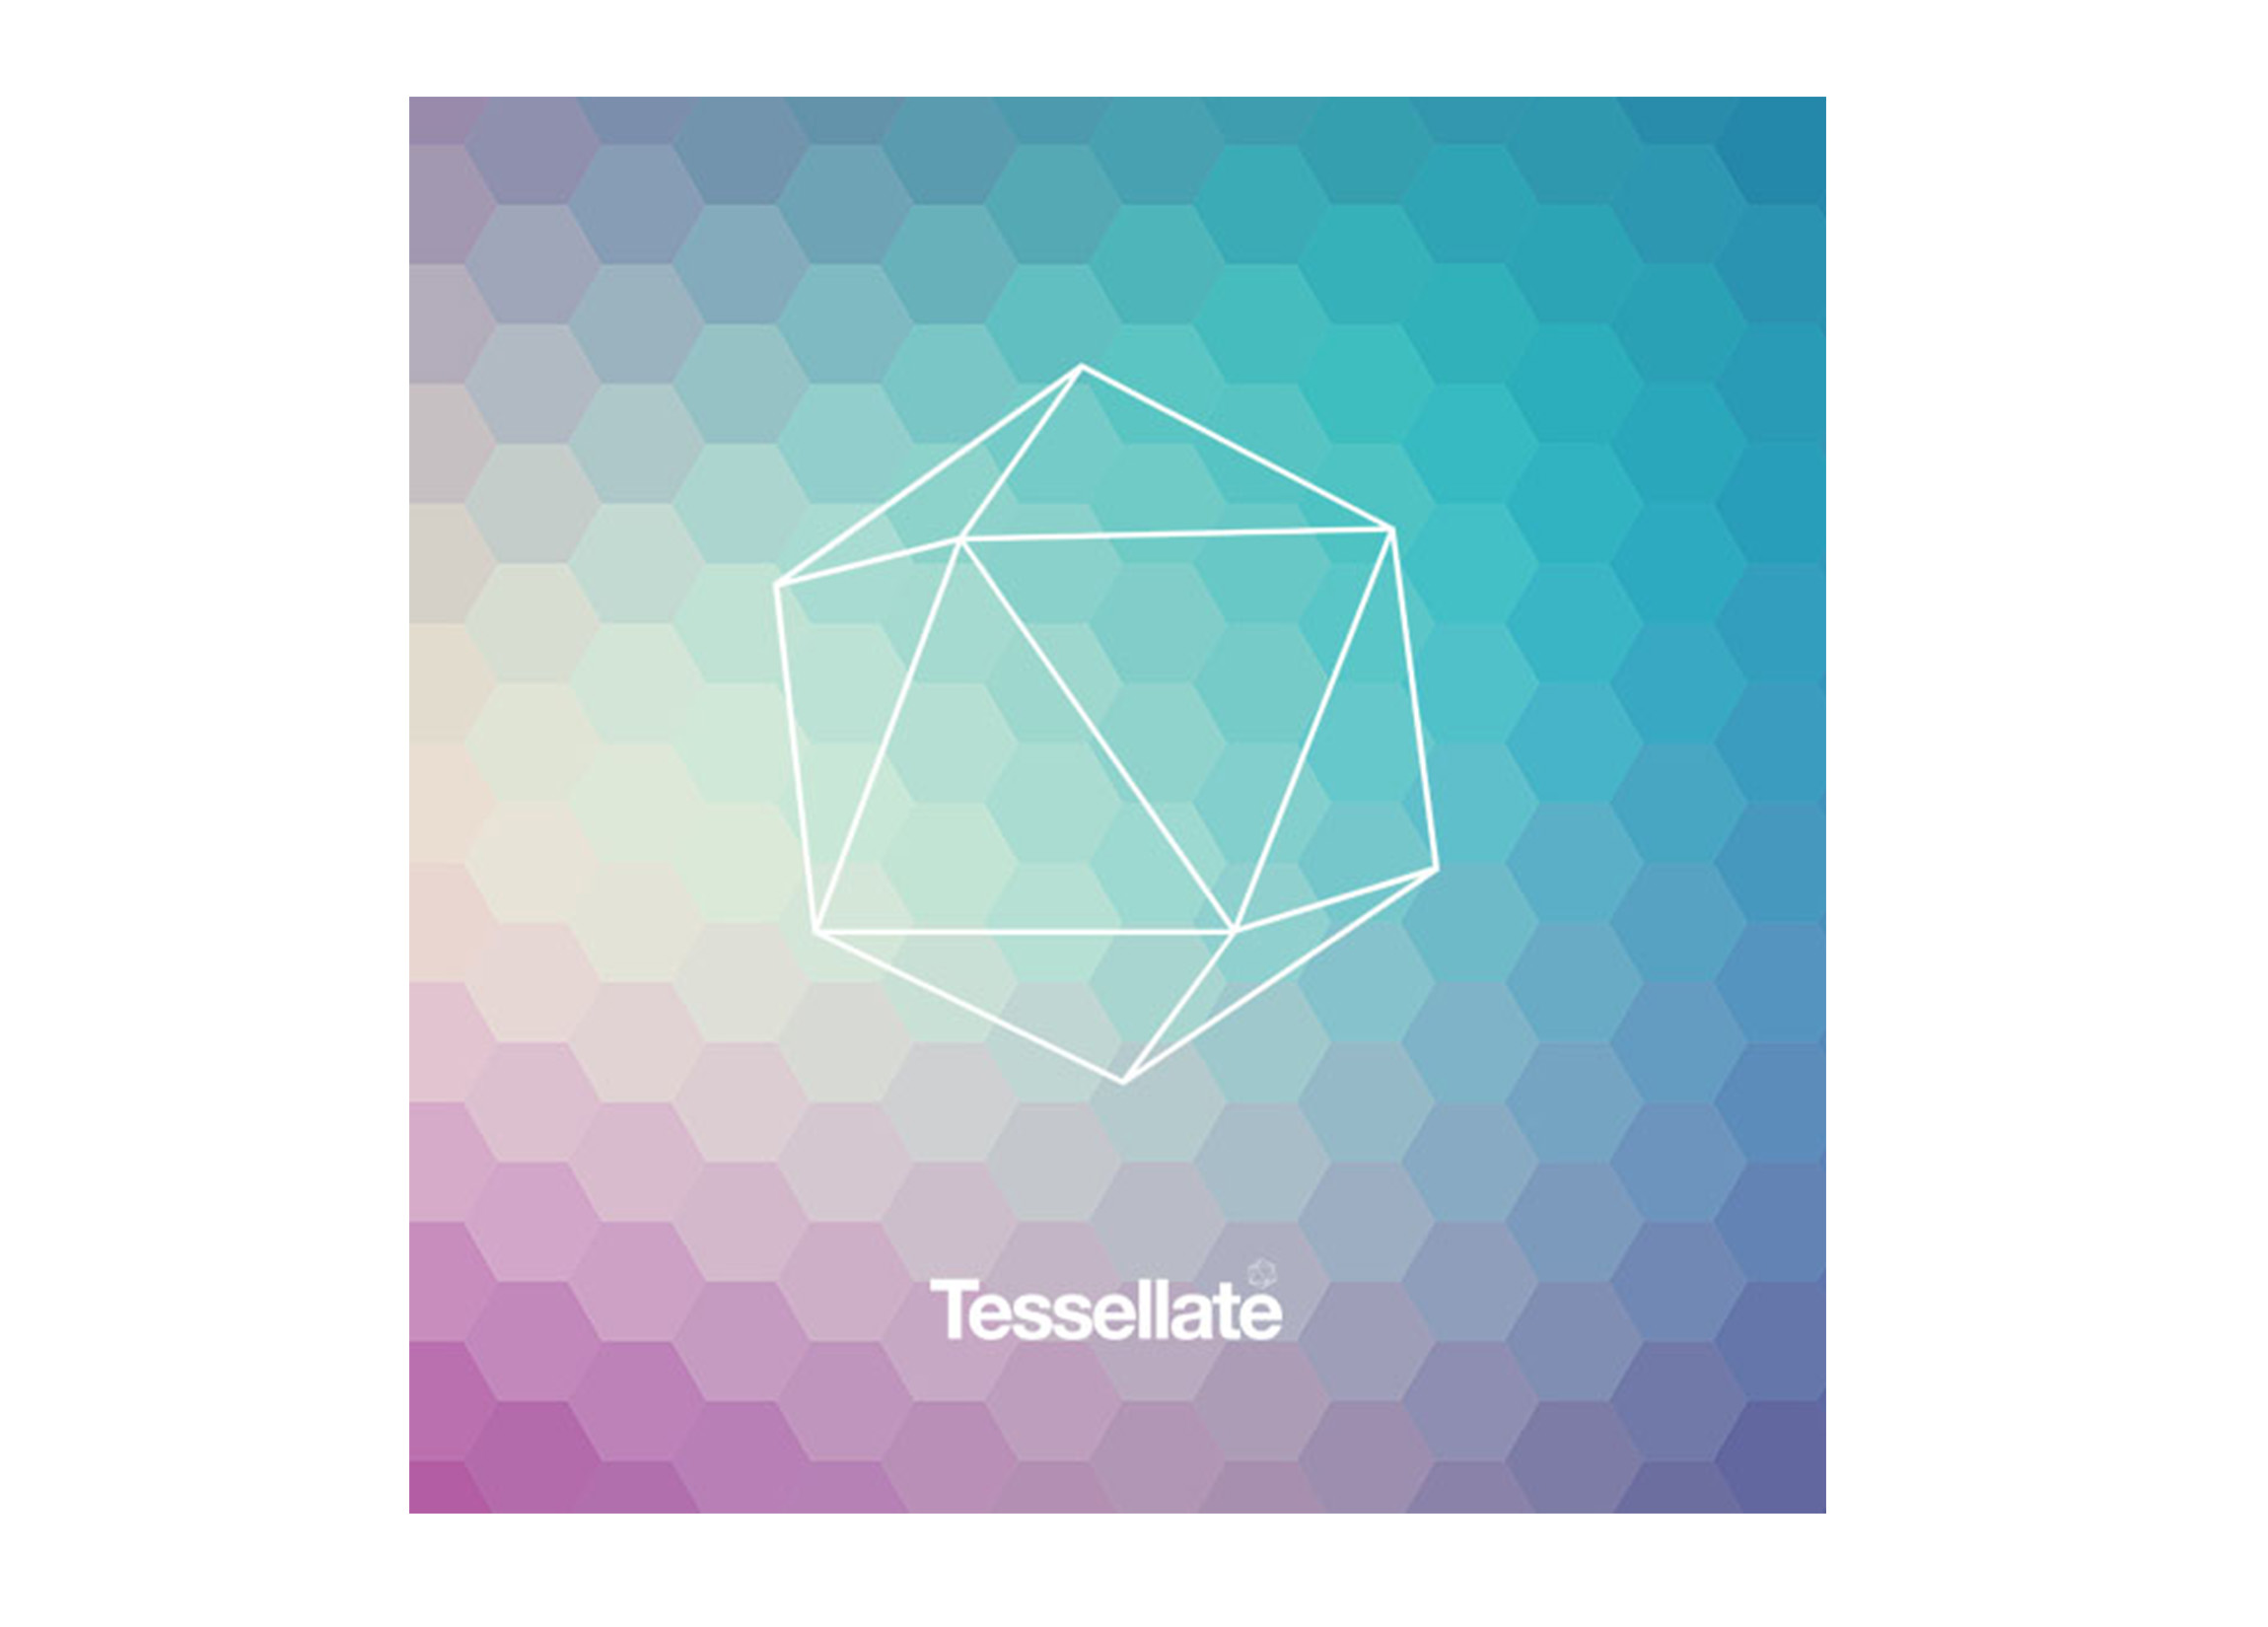 Tessellate_02.jpg